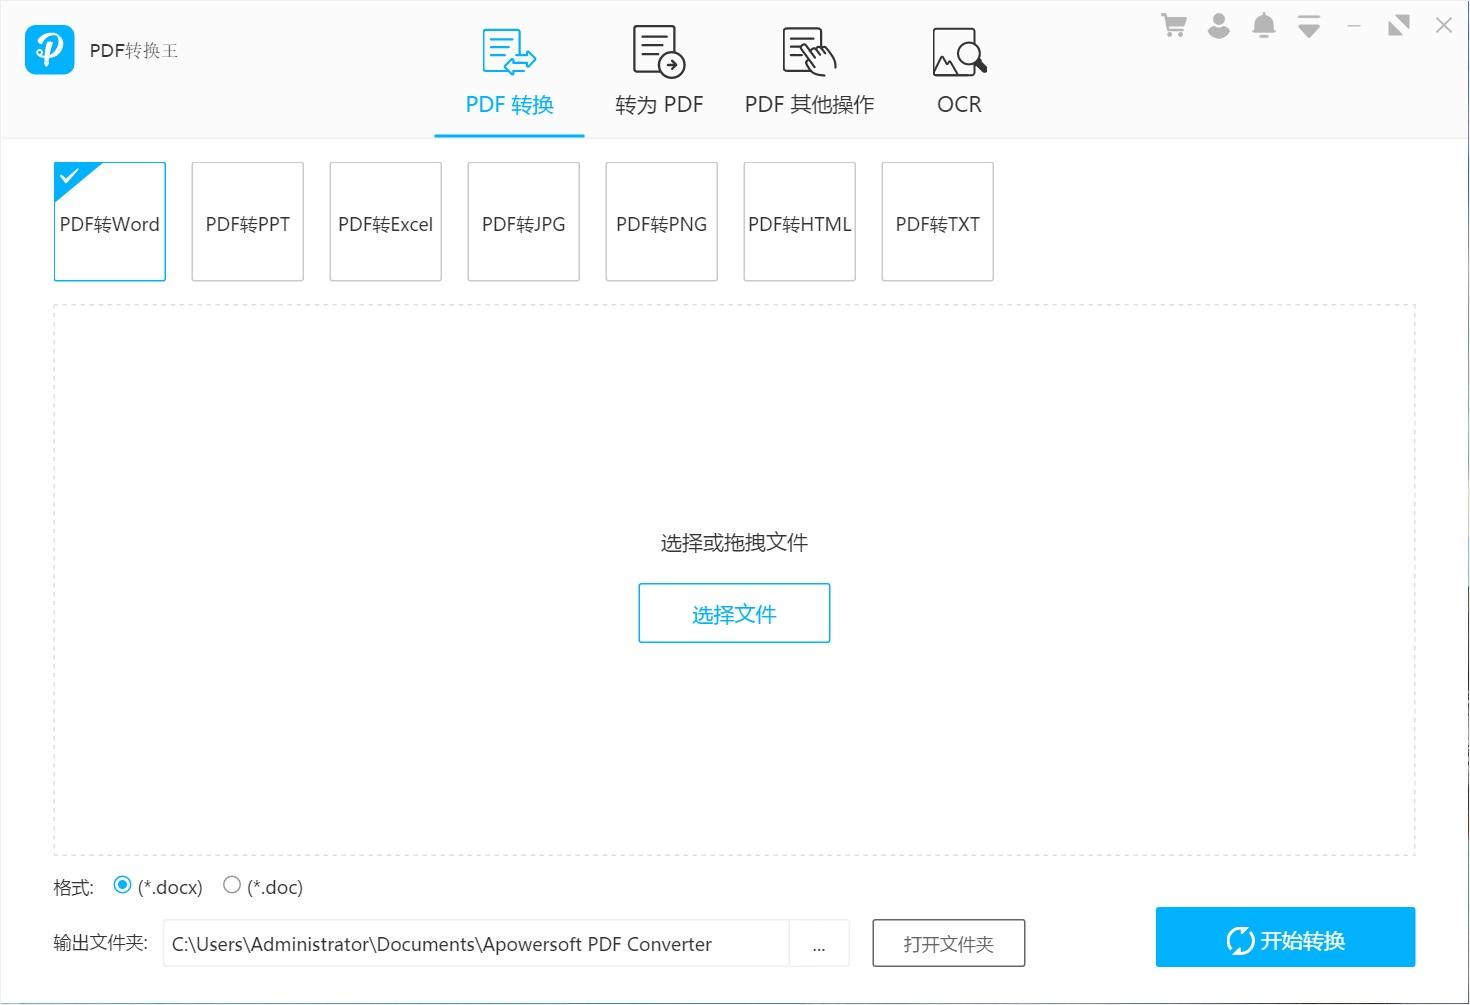 Apowersoft PDF Converter.jpg